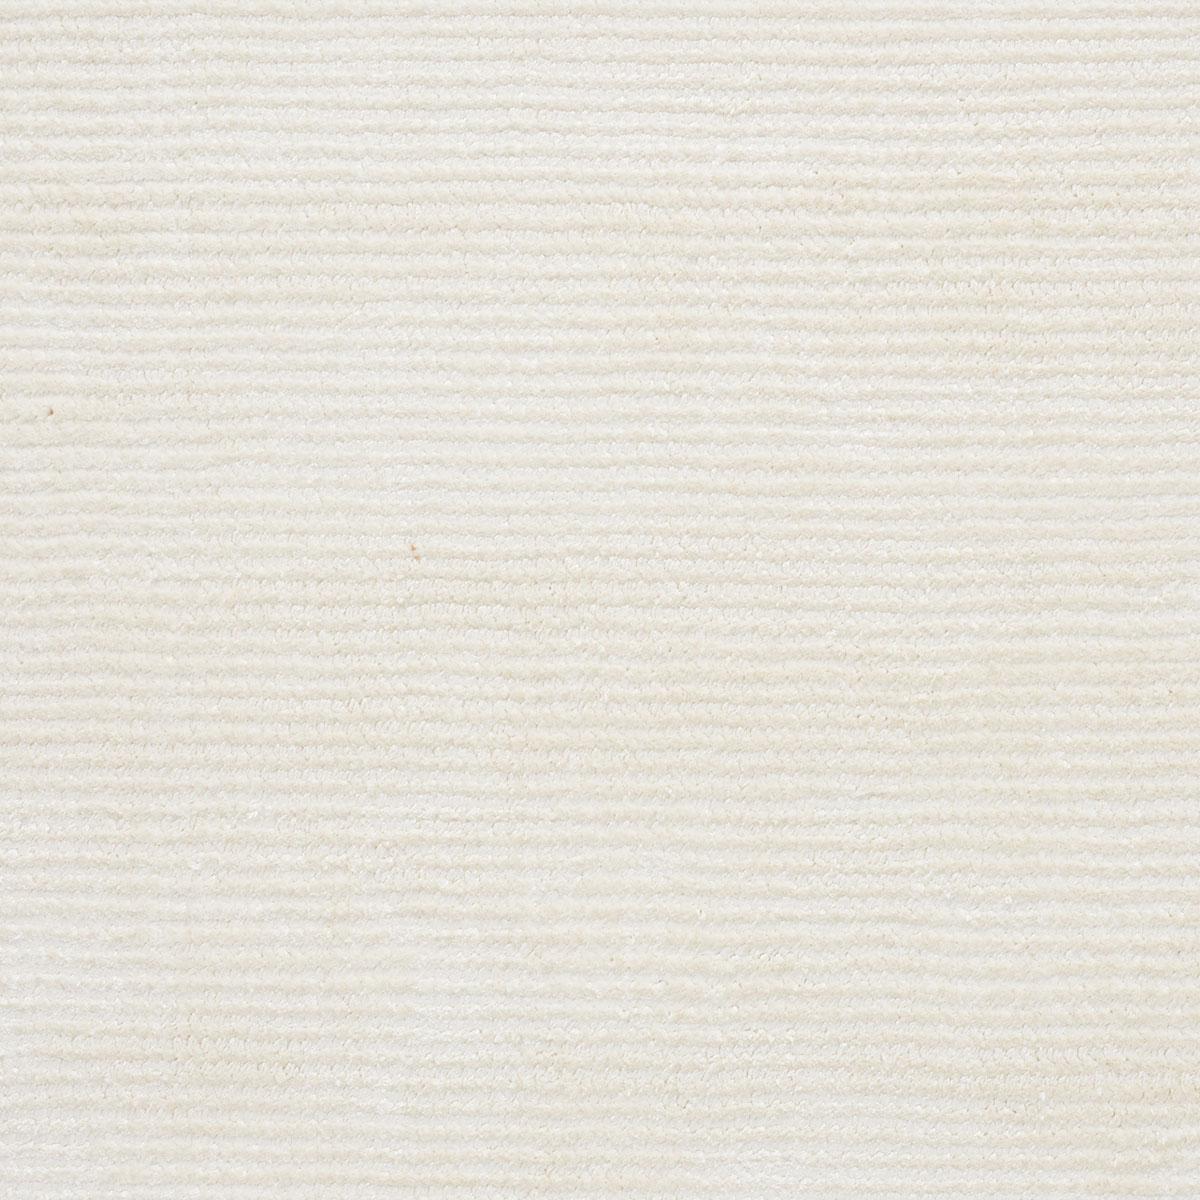 sparano-rift_faux-silk_broadloom_patterson-flynn-martin_pfm